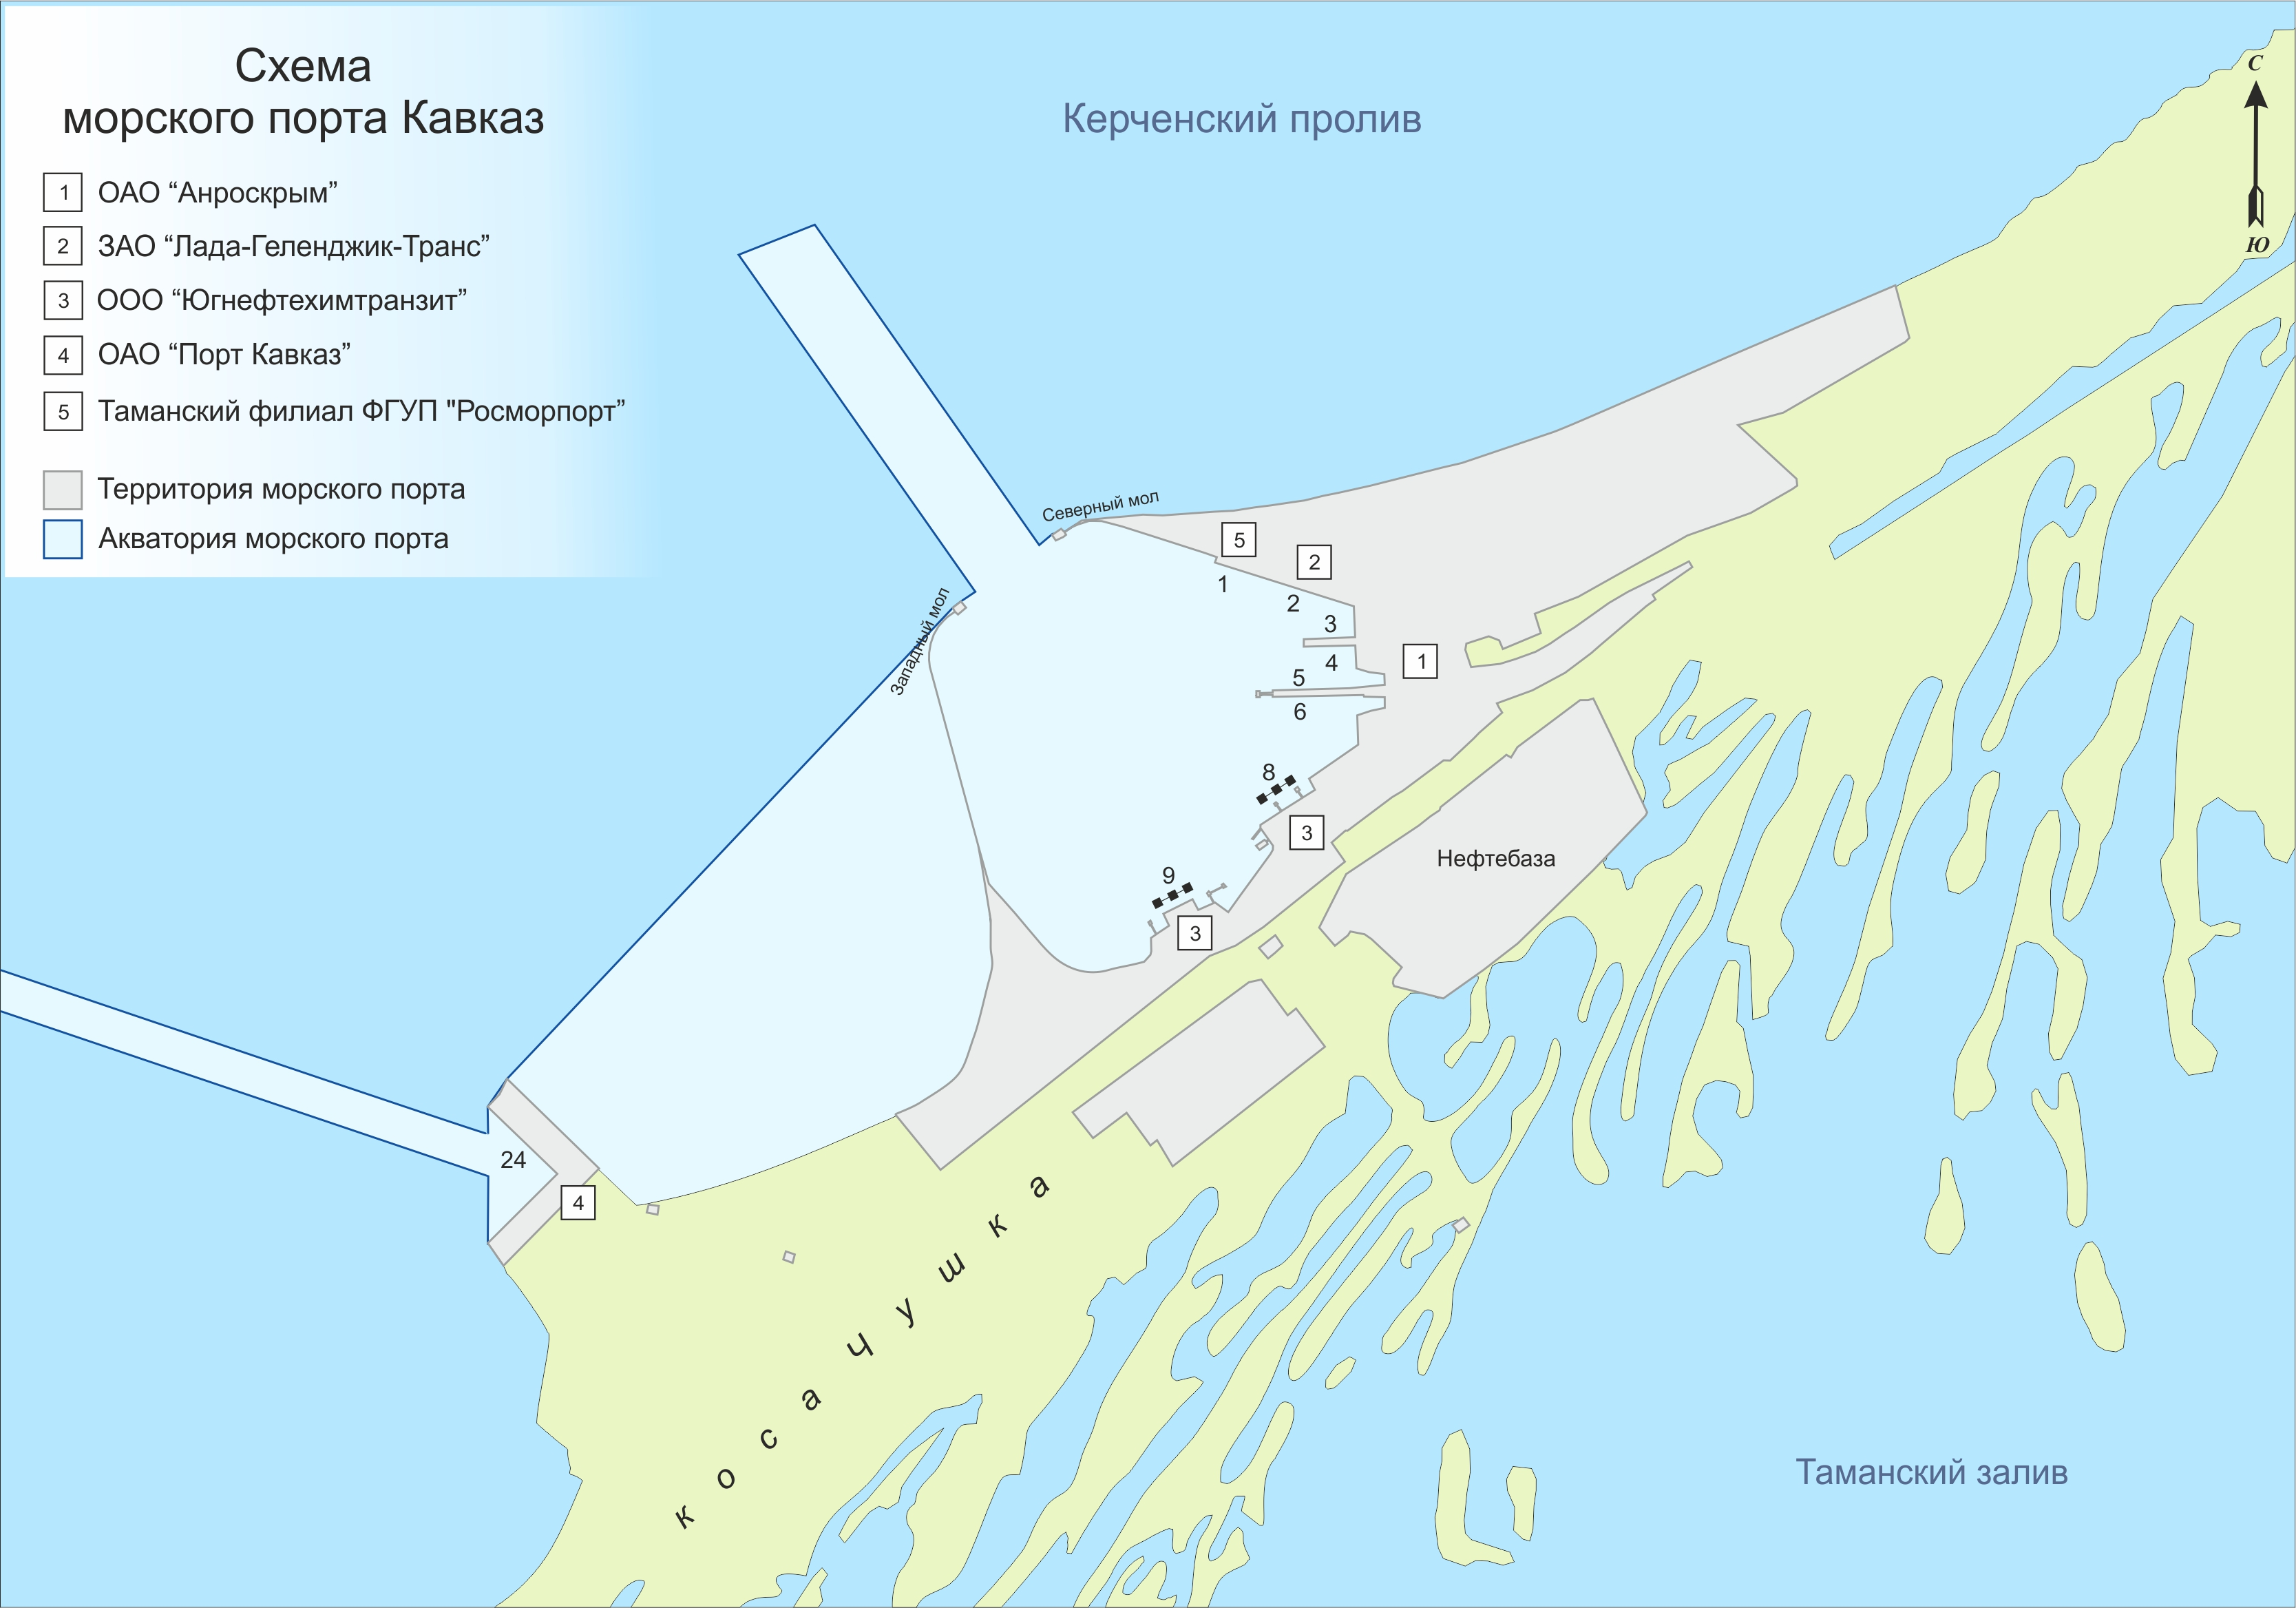 Схема проезда на паром порт кавказ